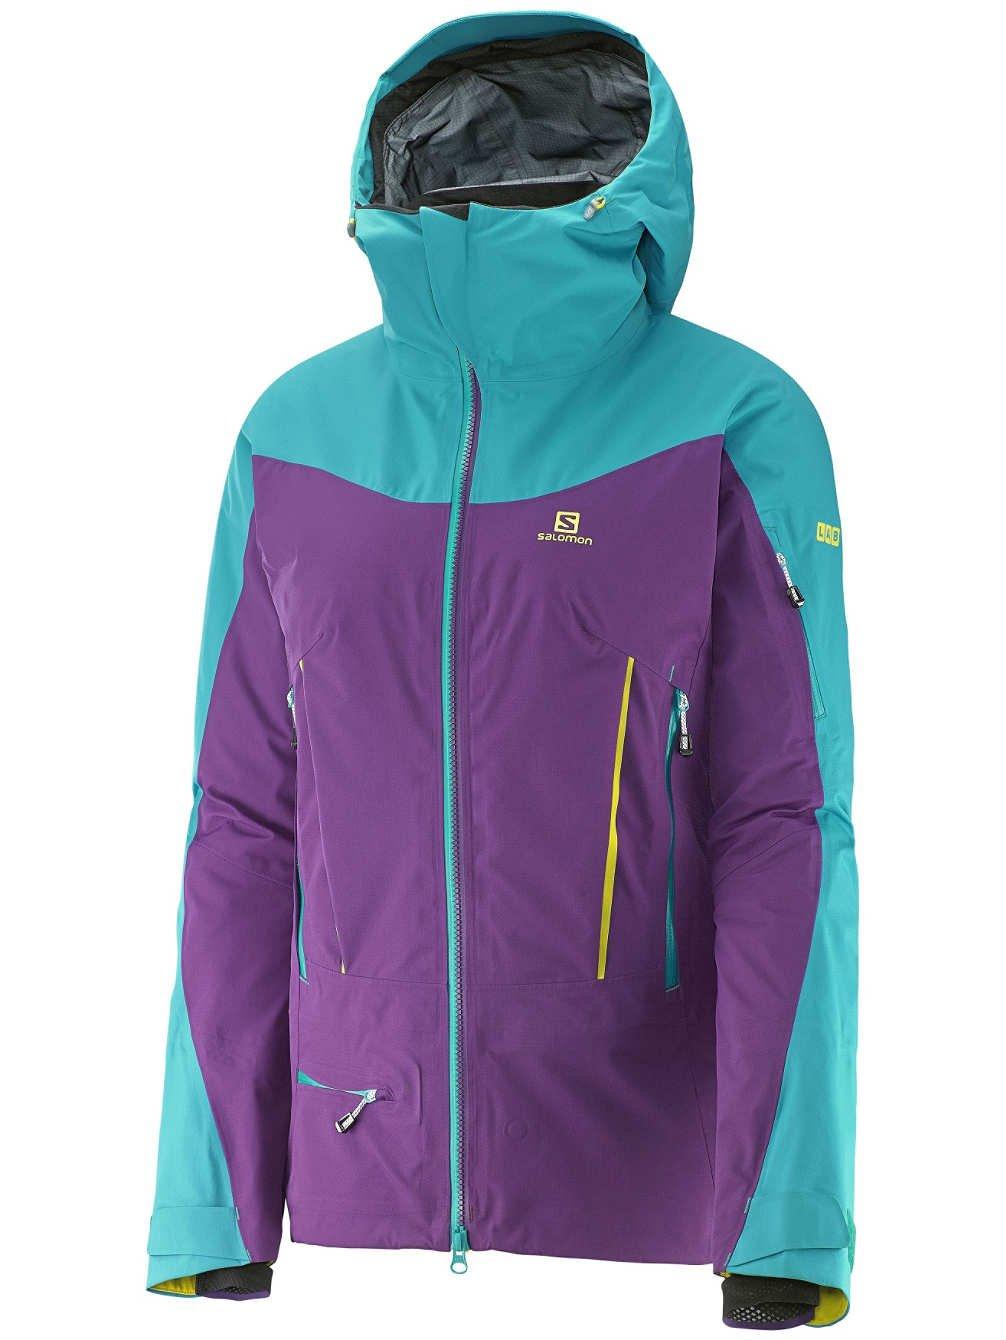 Damen Snowboard Jacke Salomon Soulquest Bc Gtx Jacket online bestellen